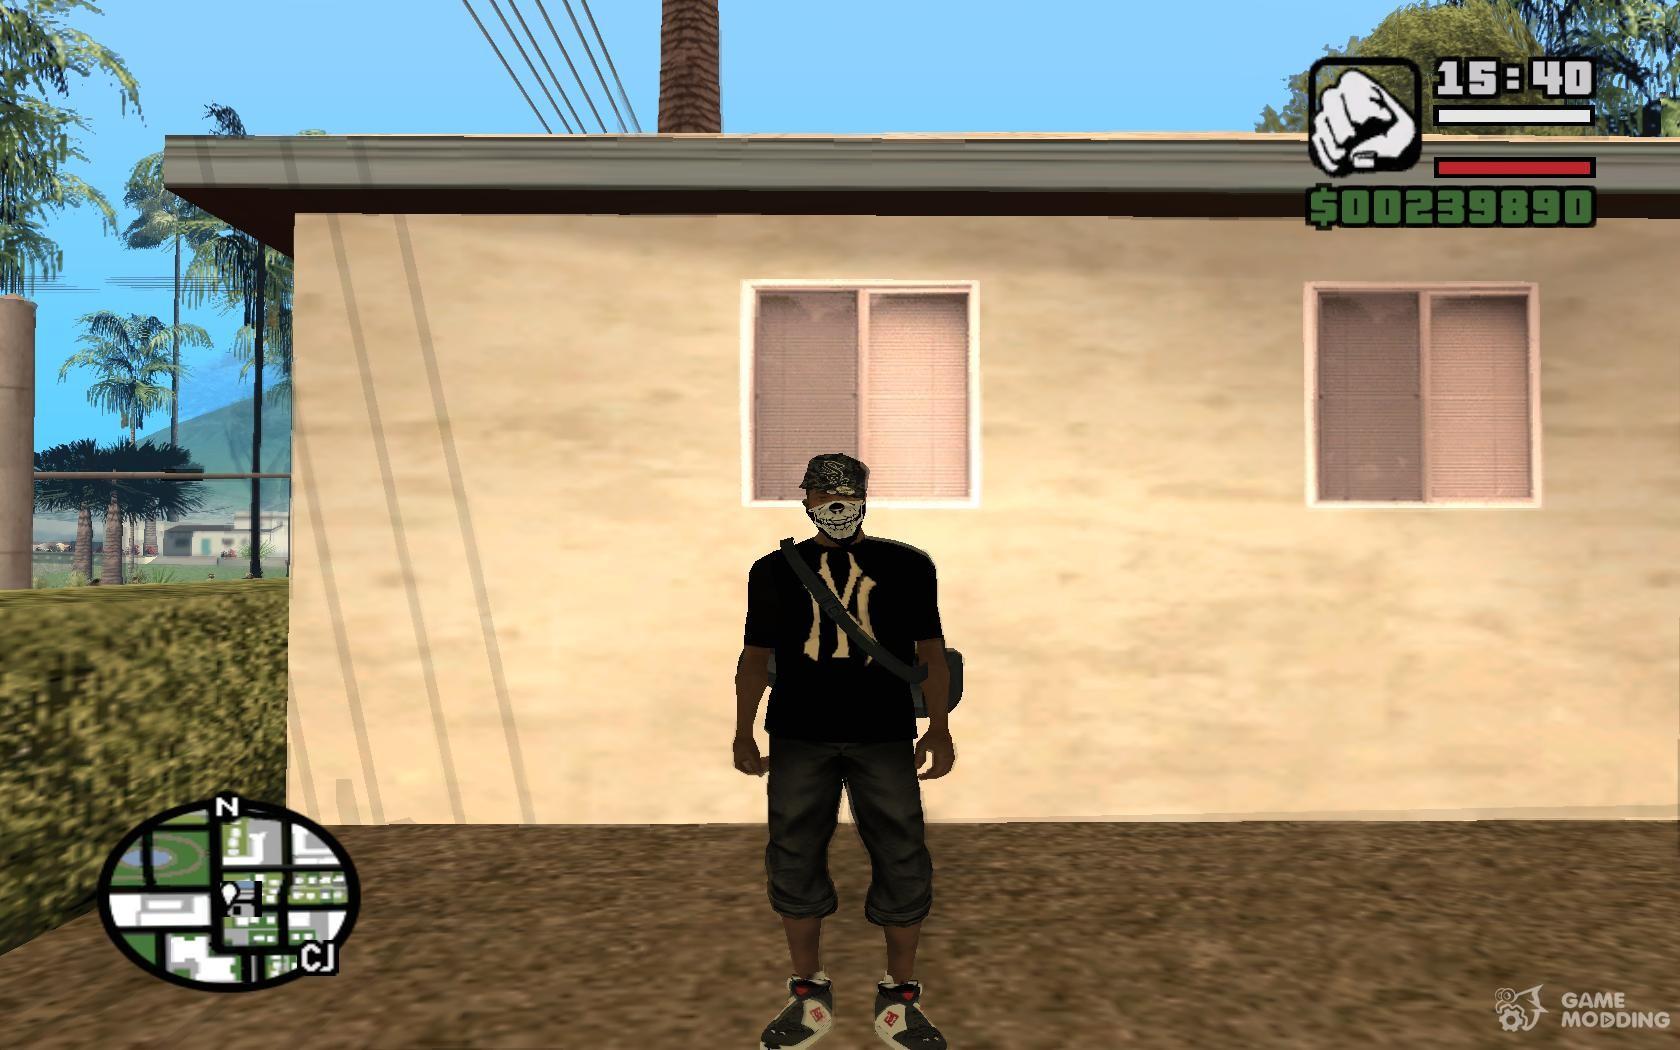 Коды к GTA: San Andreas: Все коды 85